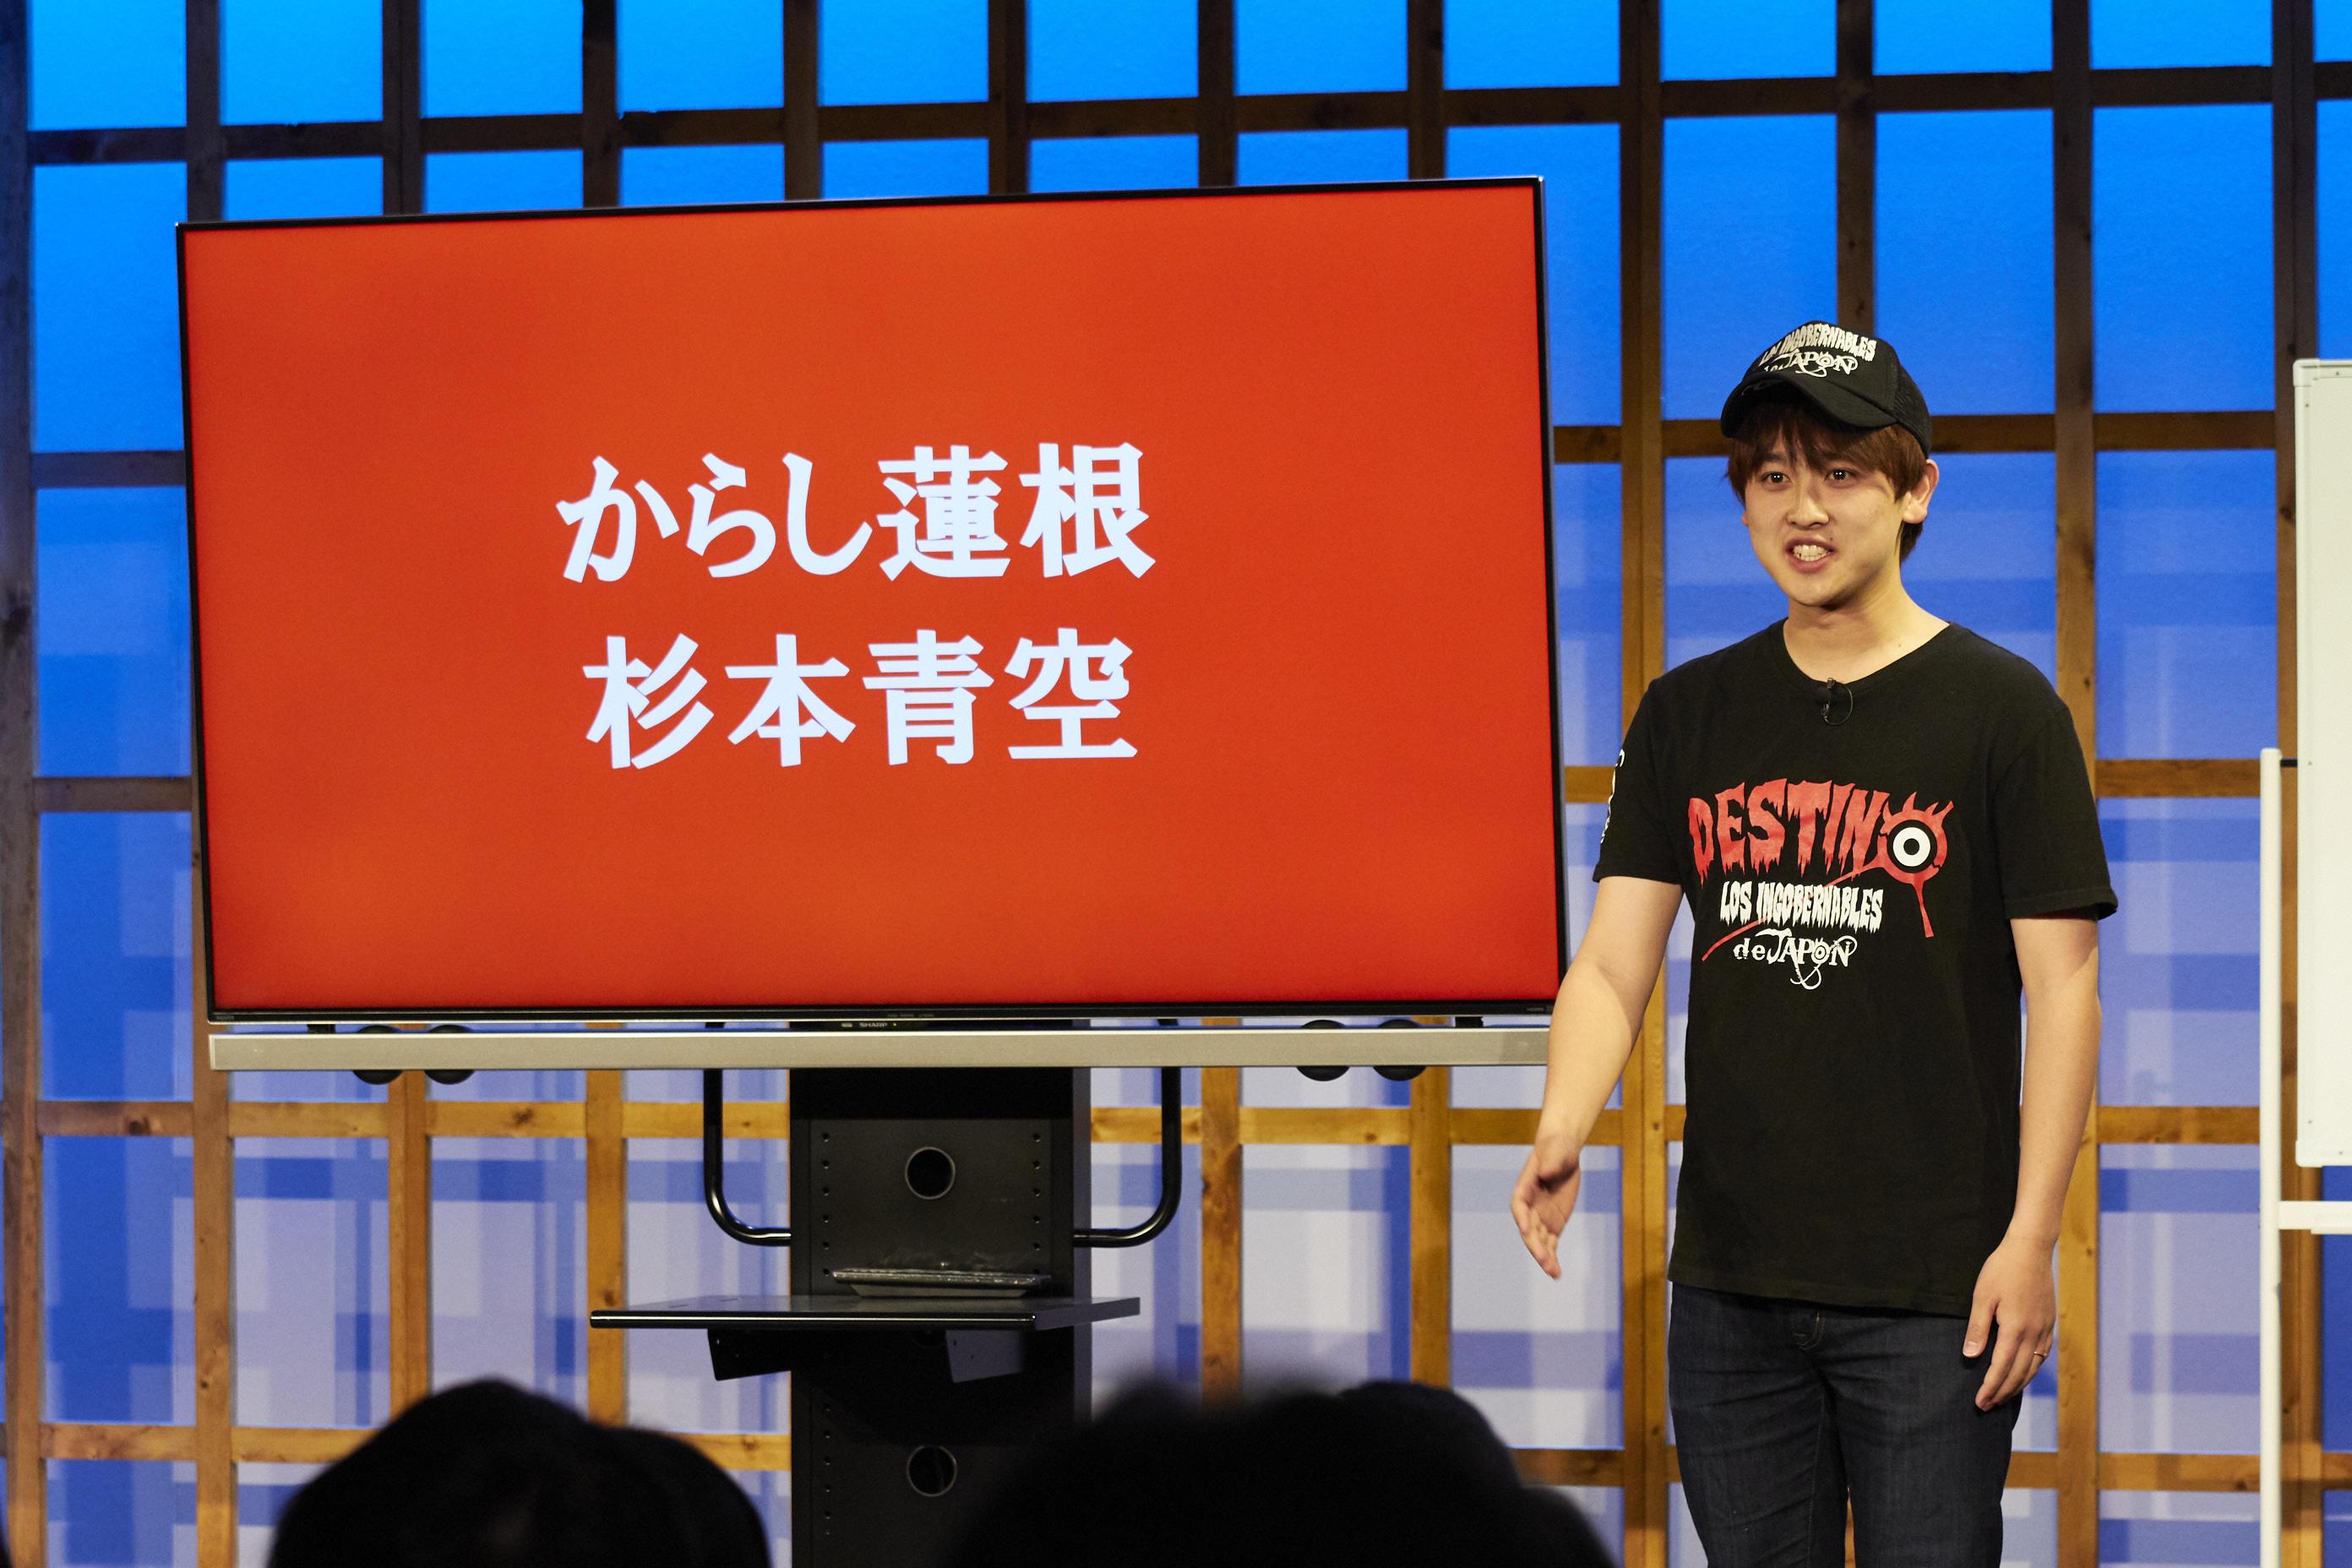 http://news.yoshimoto.co.jp/20180401095727-64d38dcaa943a92336946666d14404c5058184ff.jpg